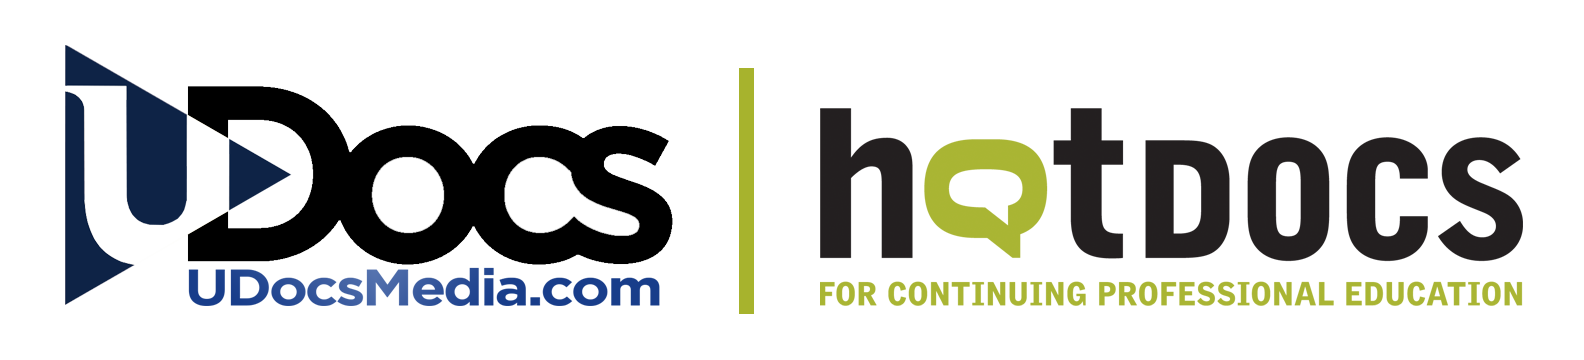 UDocs and HotDocs Logos together